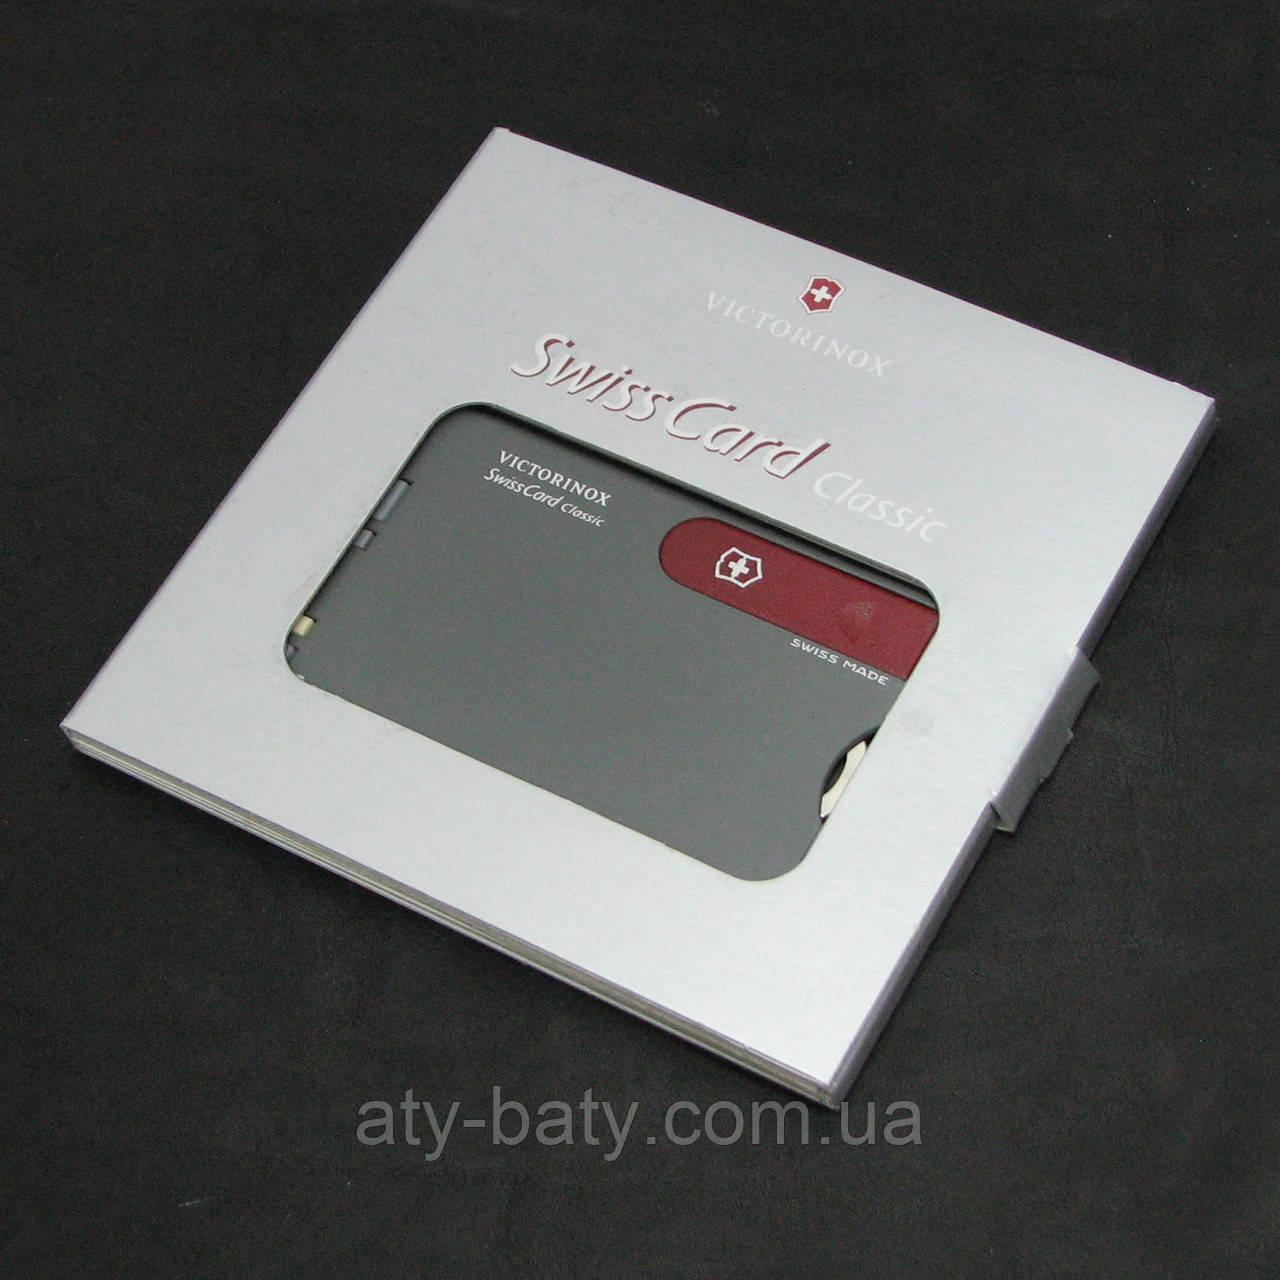 Набор Victorinox Swiss Card (0.7106.V)